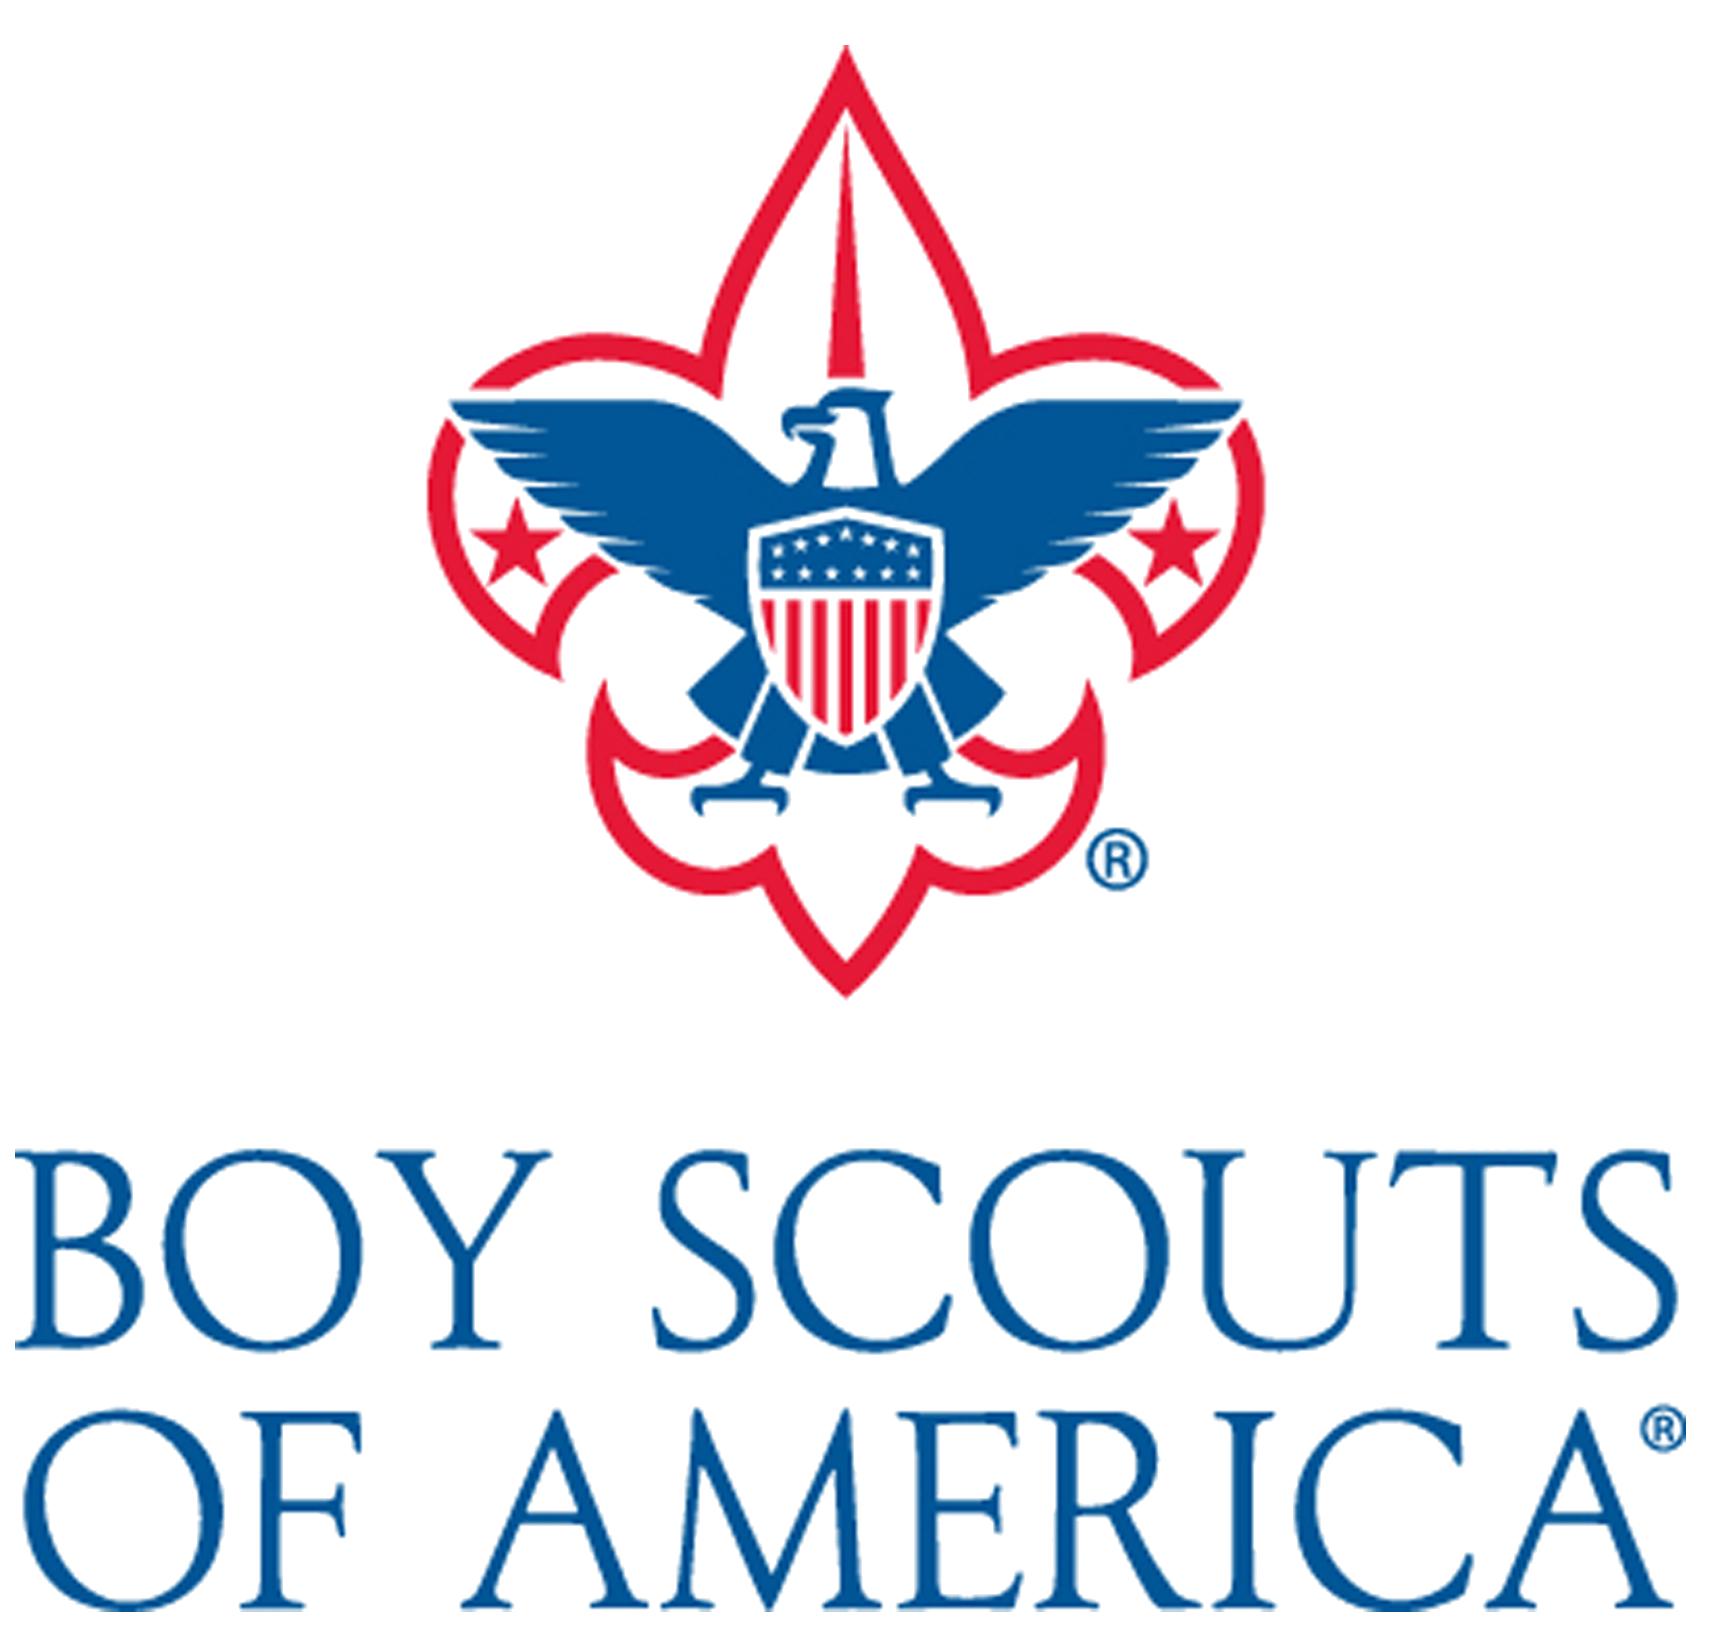 boy scouts of america logo.png